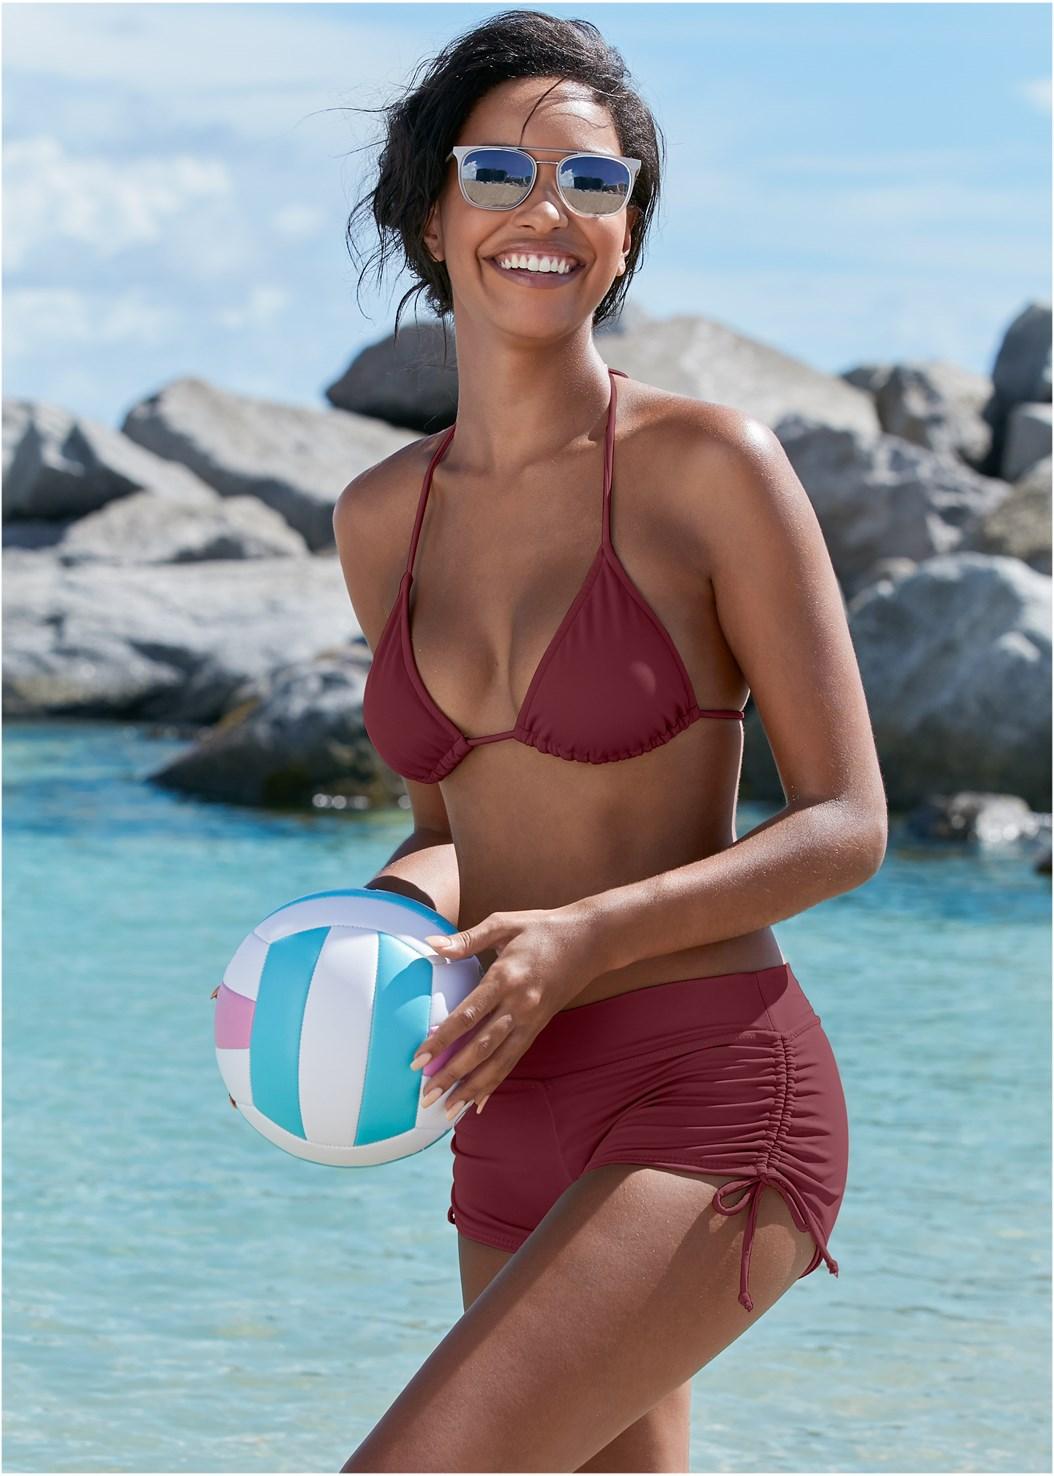 Adjustable Side Swim Short,Triangle String Bikini Top